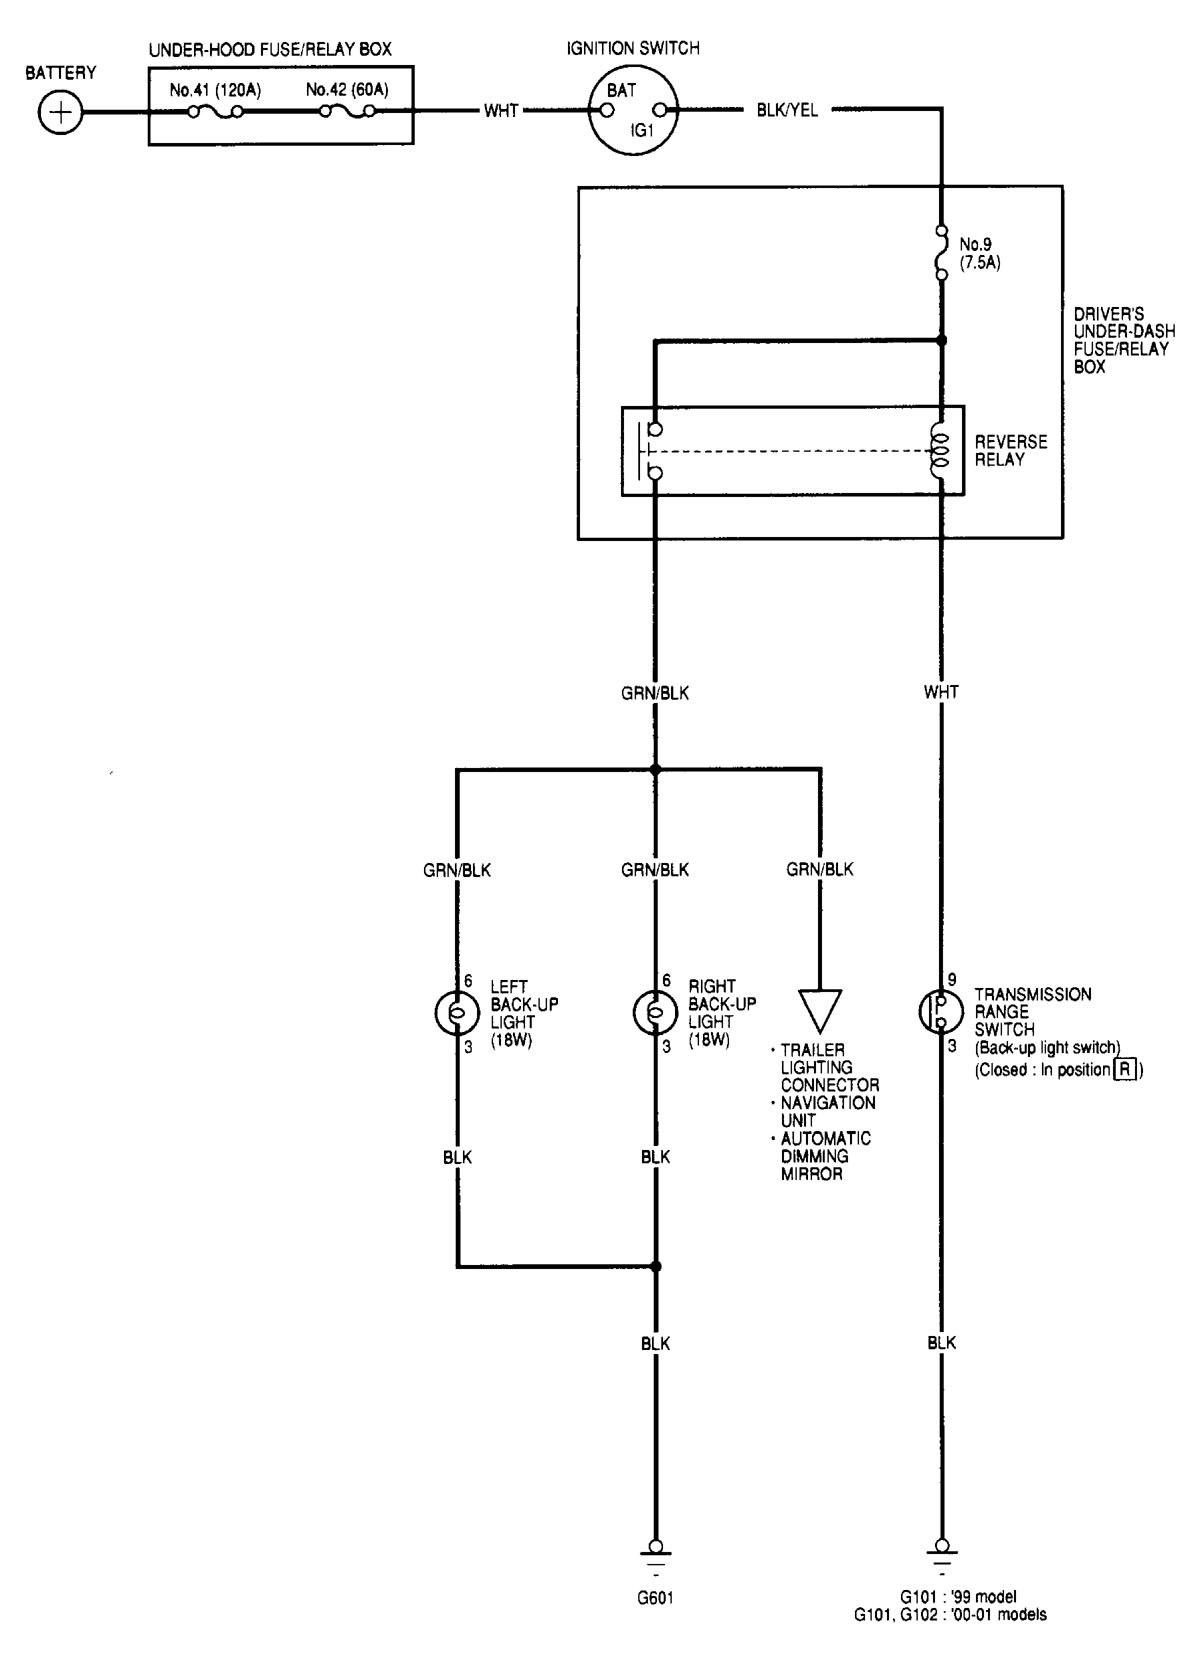 2000 Acura Tl Wiring Diagram Block Explanation Integra Diagrams Stop Lamp Carknowledge Stereo